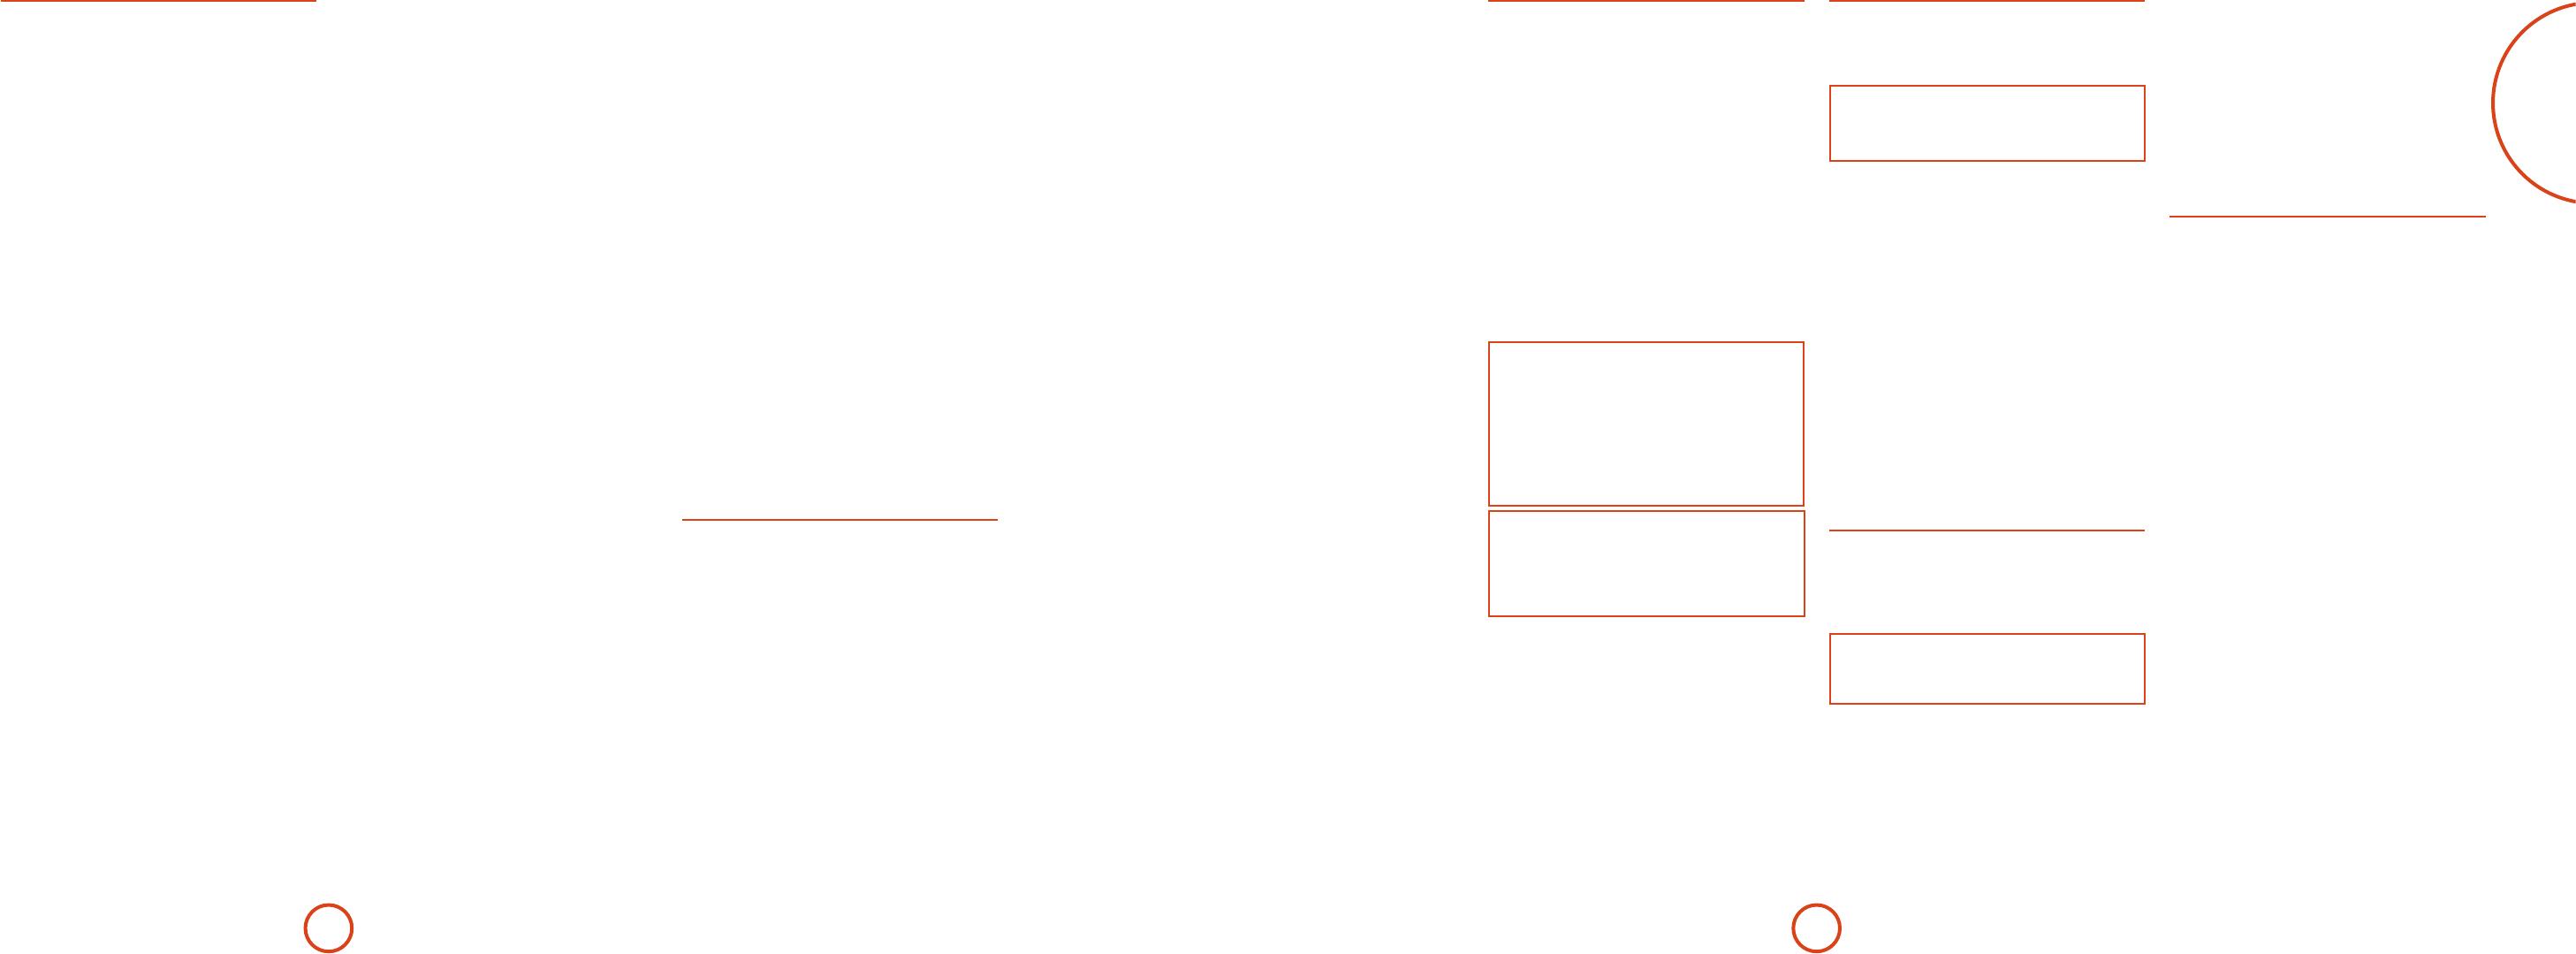 Handleiding Arcam AVR450 (pagina 18 van 206) (Deutsch